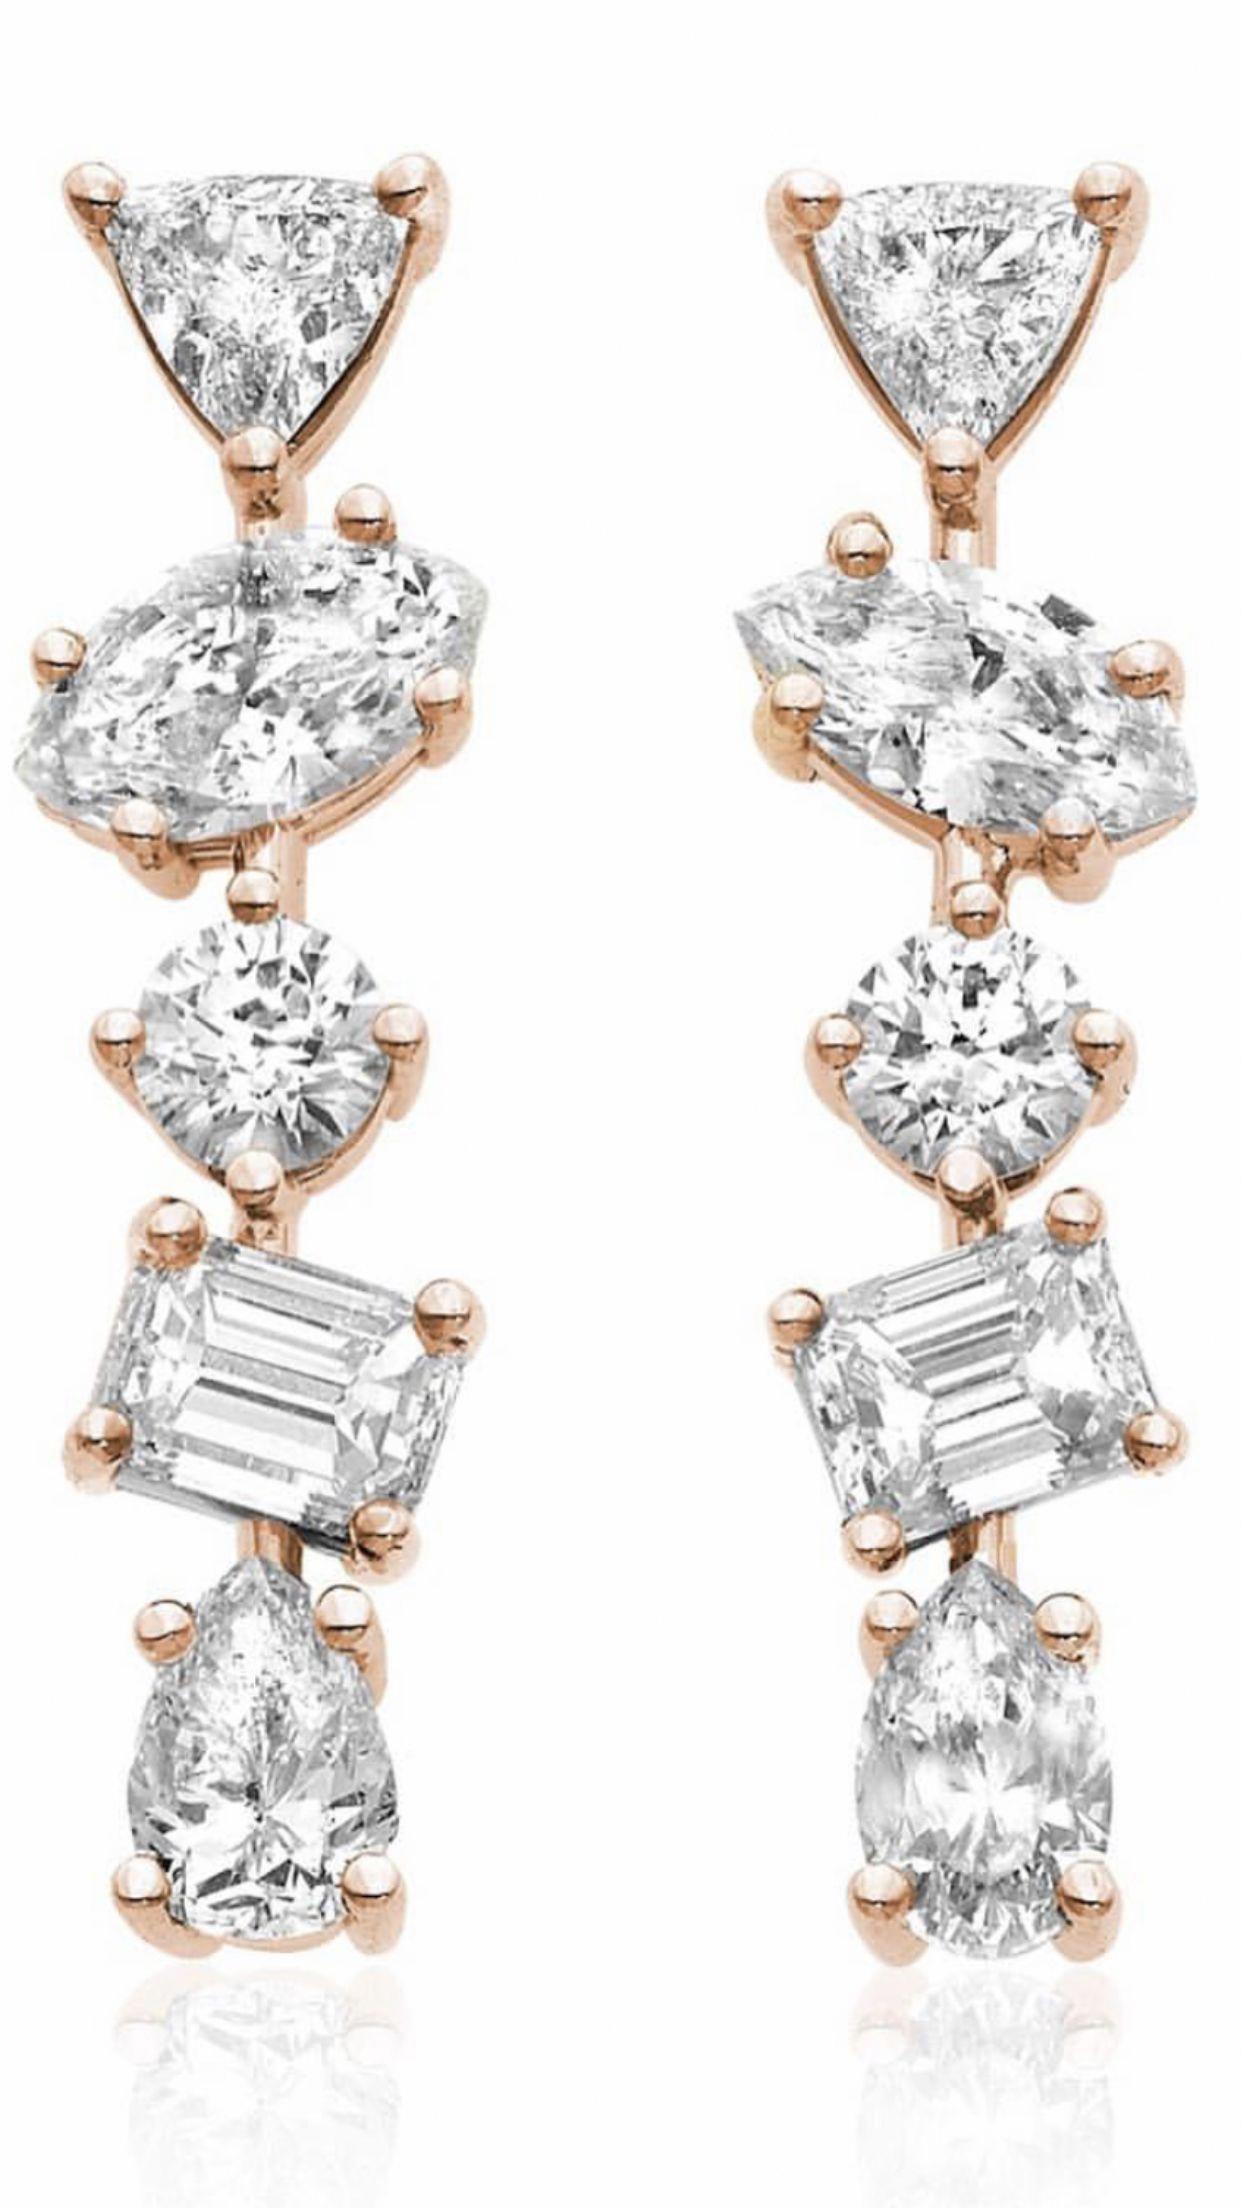 To clean diamond precious jewelry, develop an option